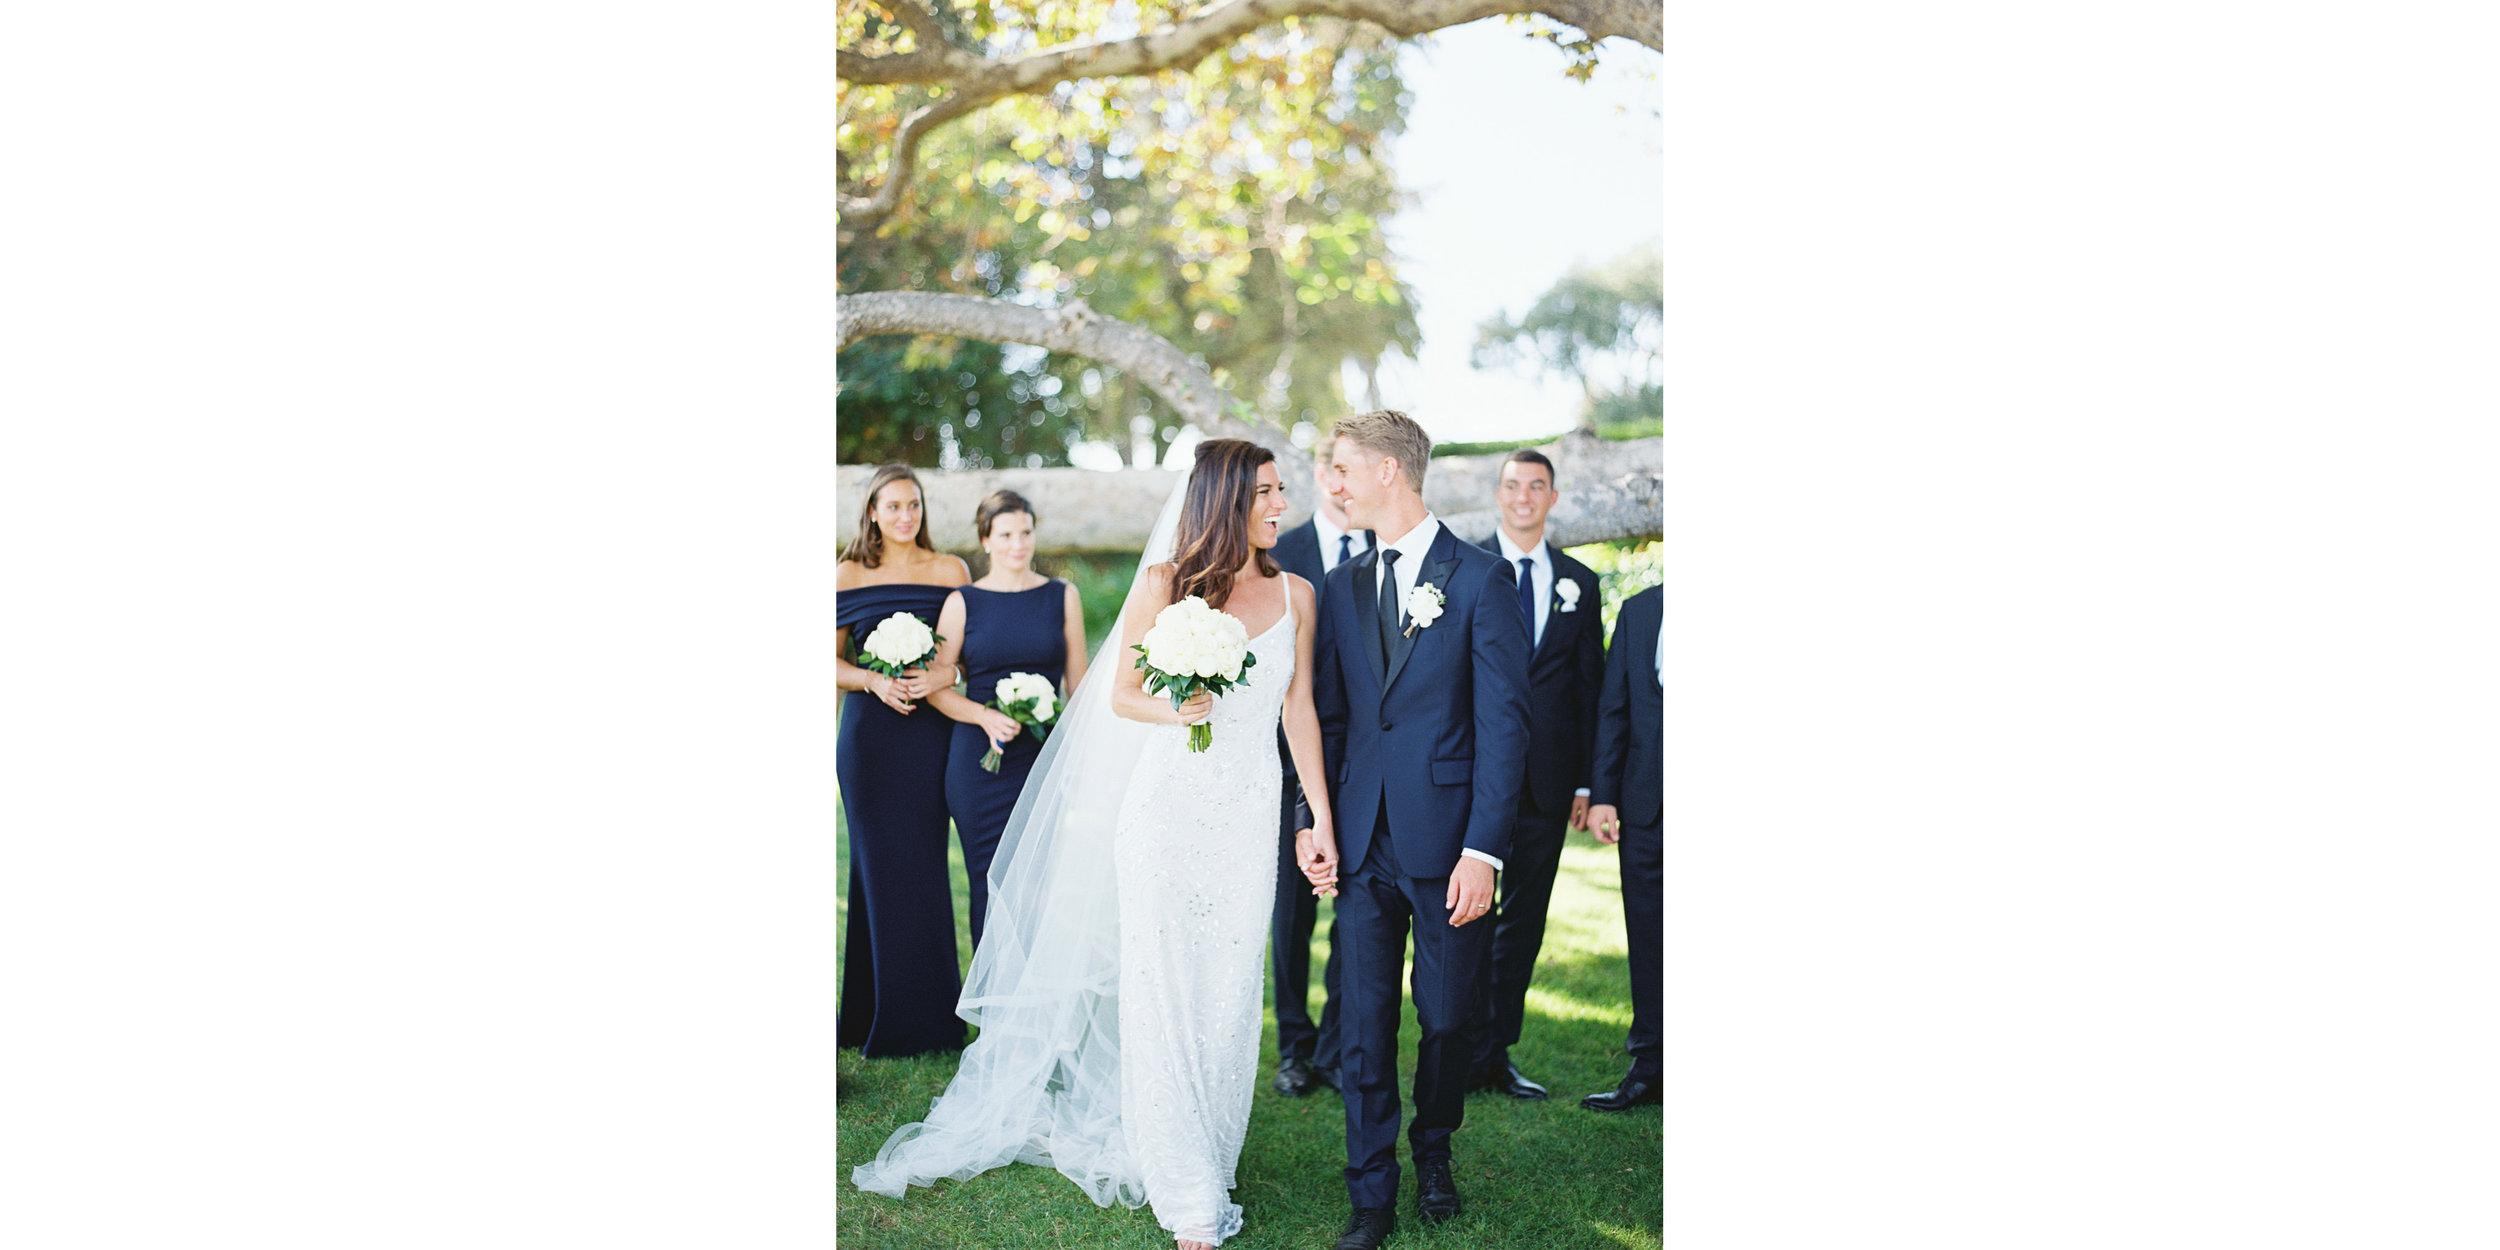 RachelOwensPhotography - 11.jpg